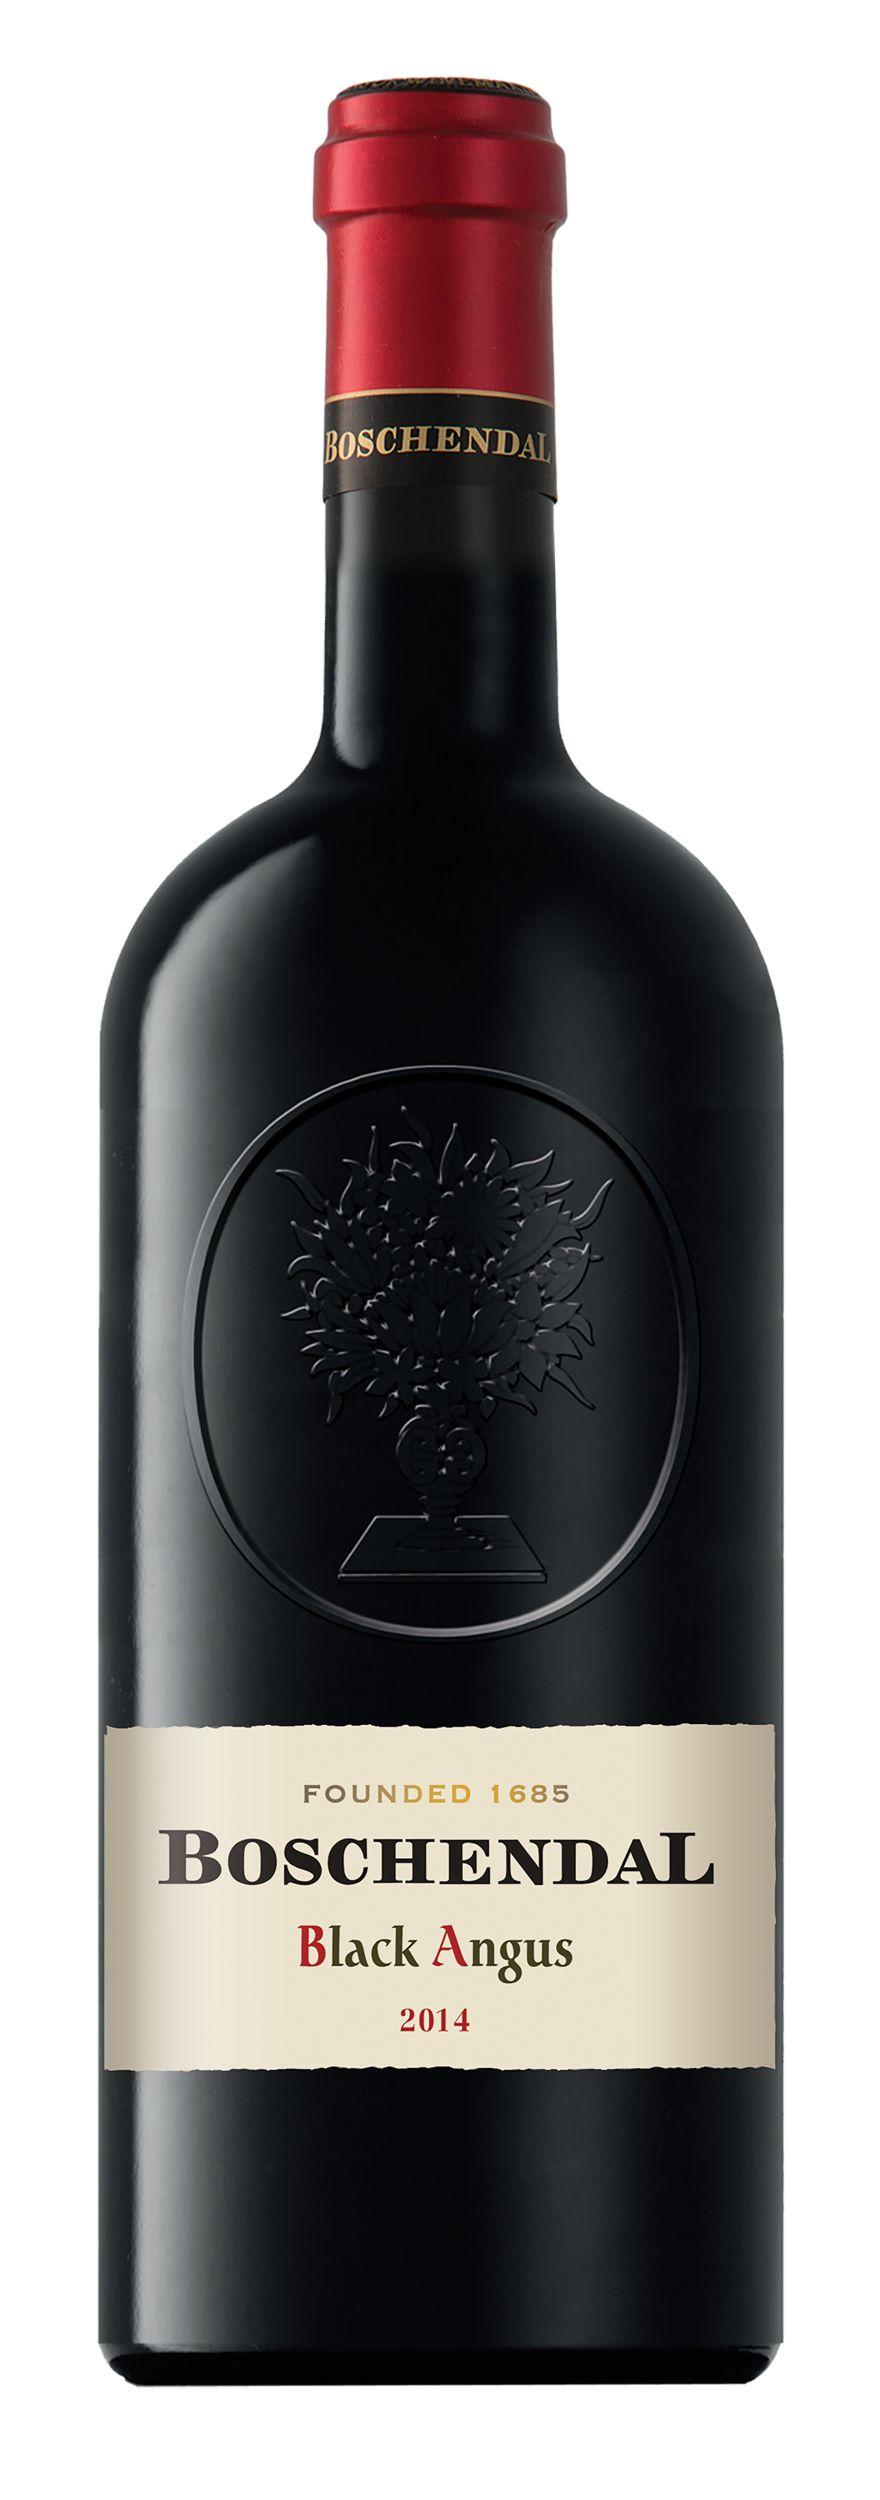 Boschendal Black Angus 2014